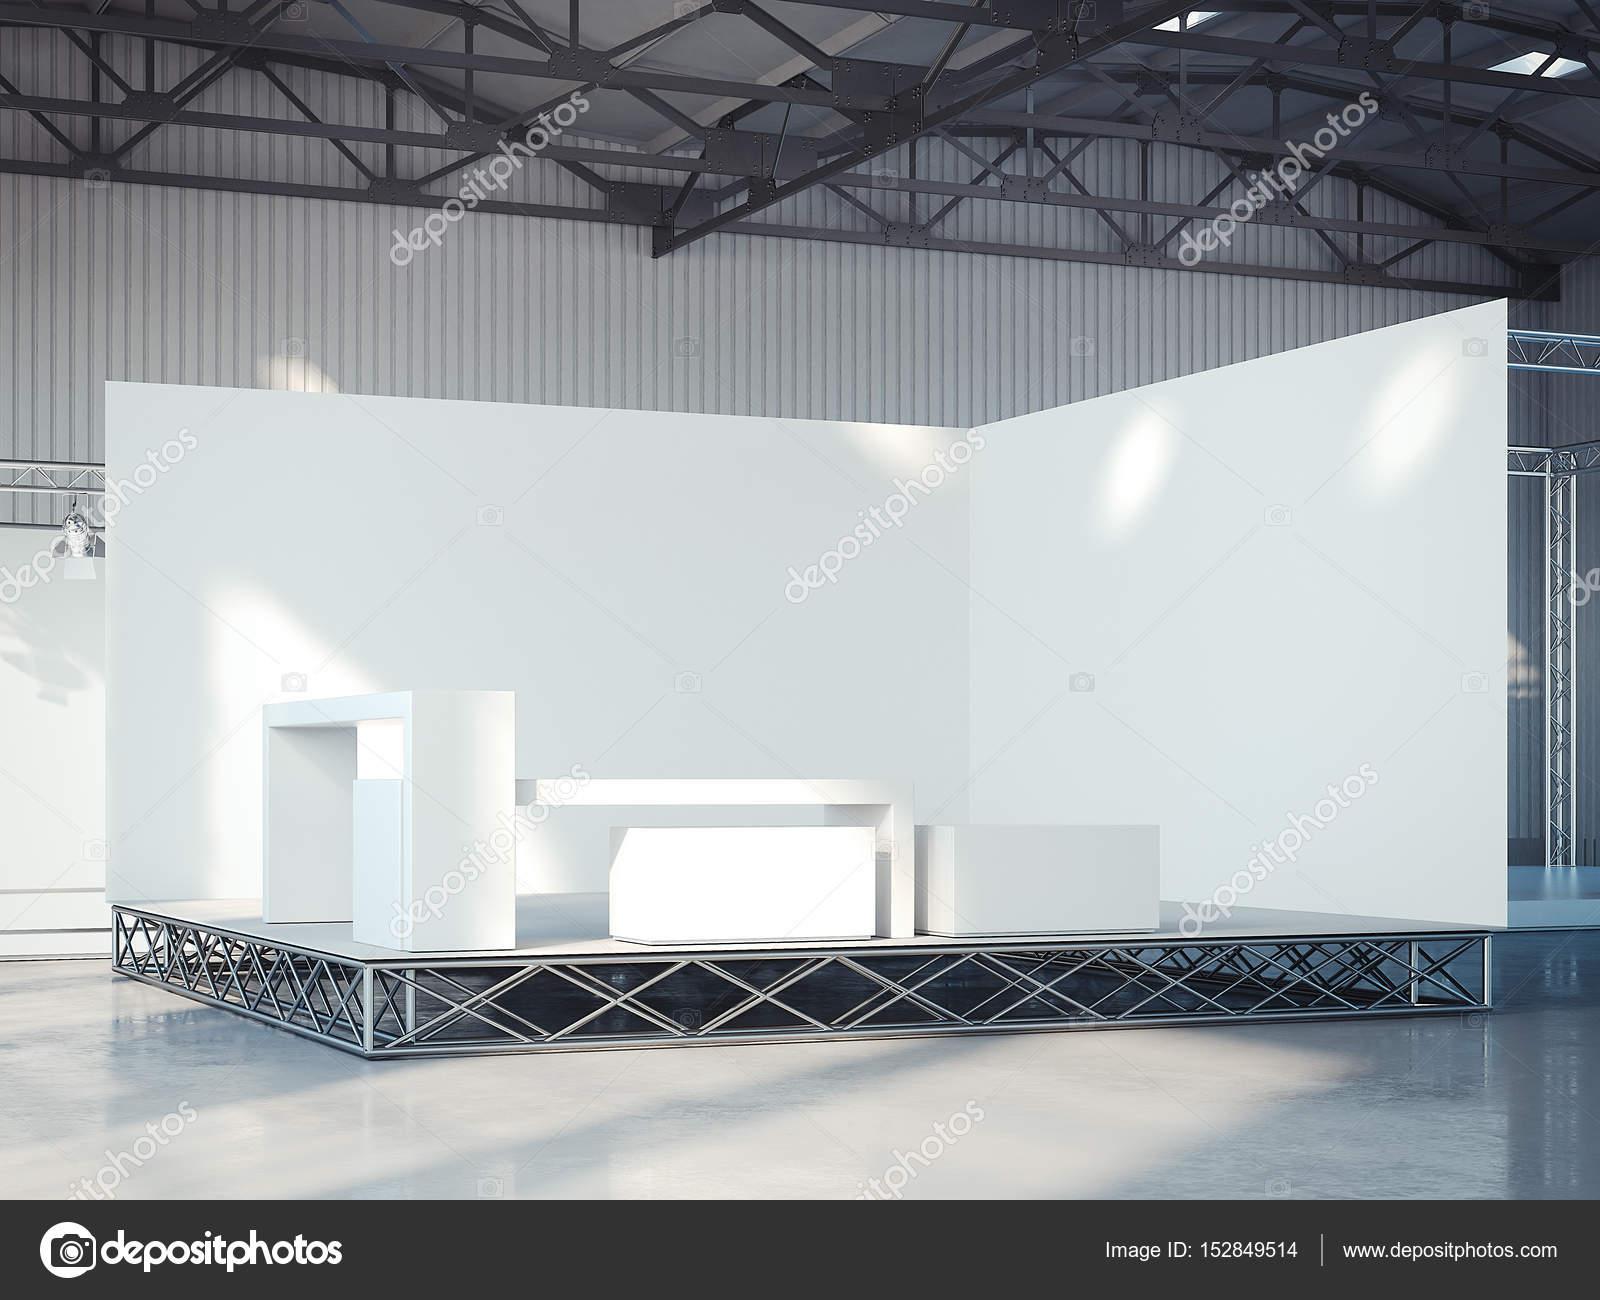 https://st3.depositphotos.com/1765561/15284/i/1600/depositphotos_152849514-stock-photo-empty-stage-in-modern-exhibition.jpg